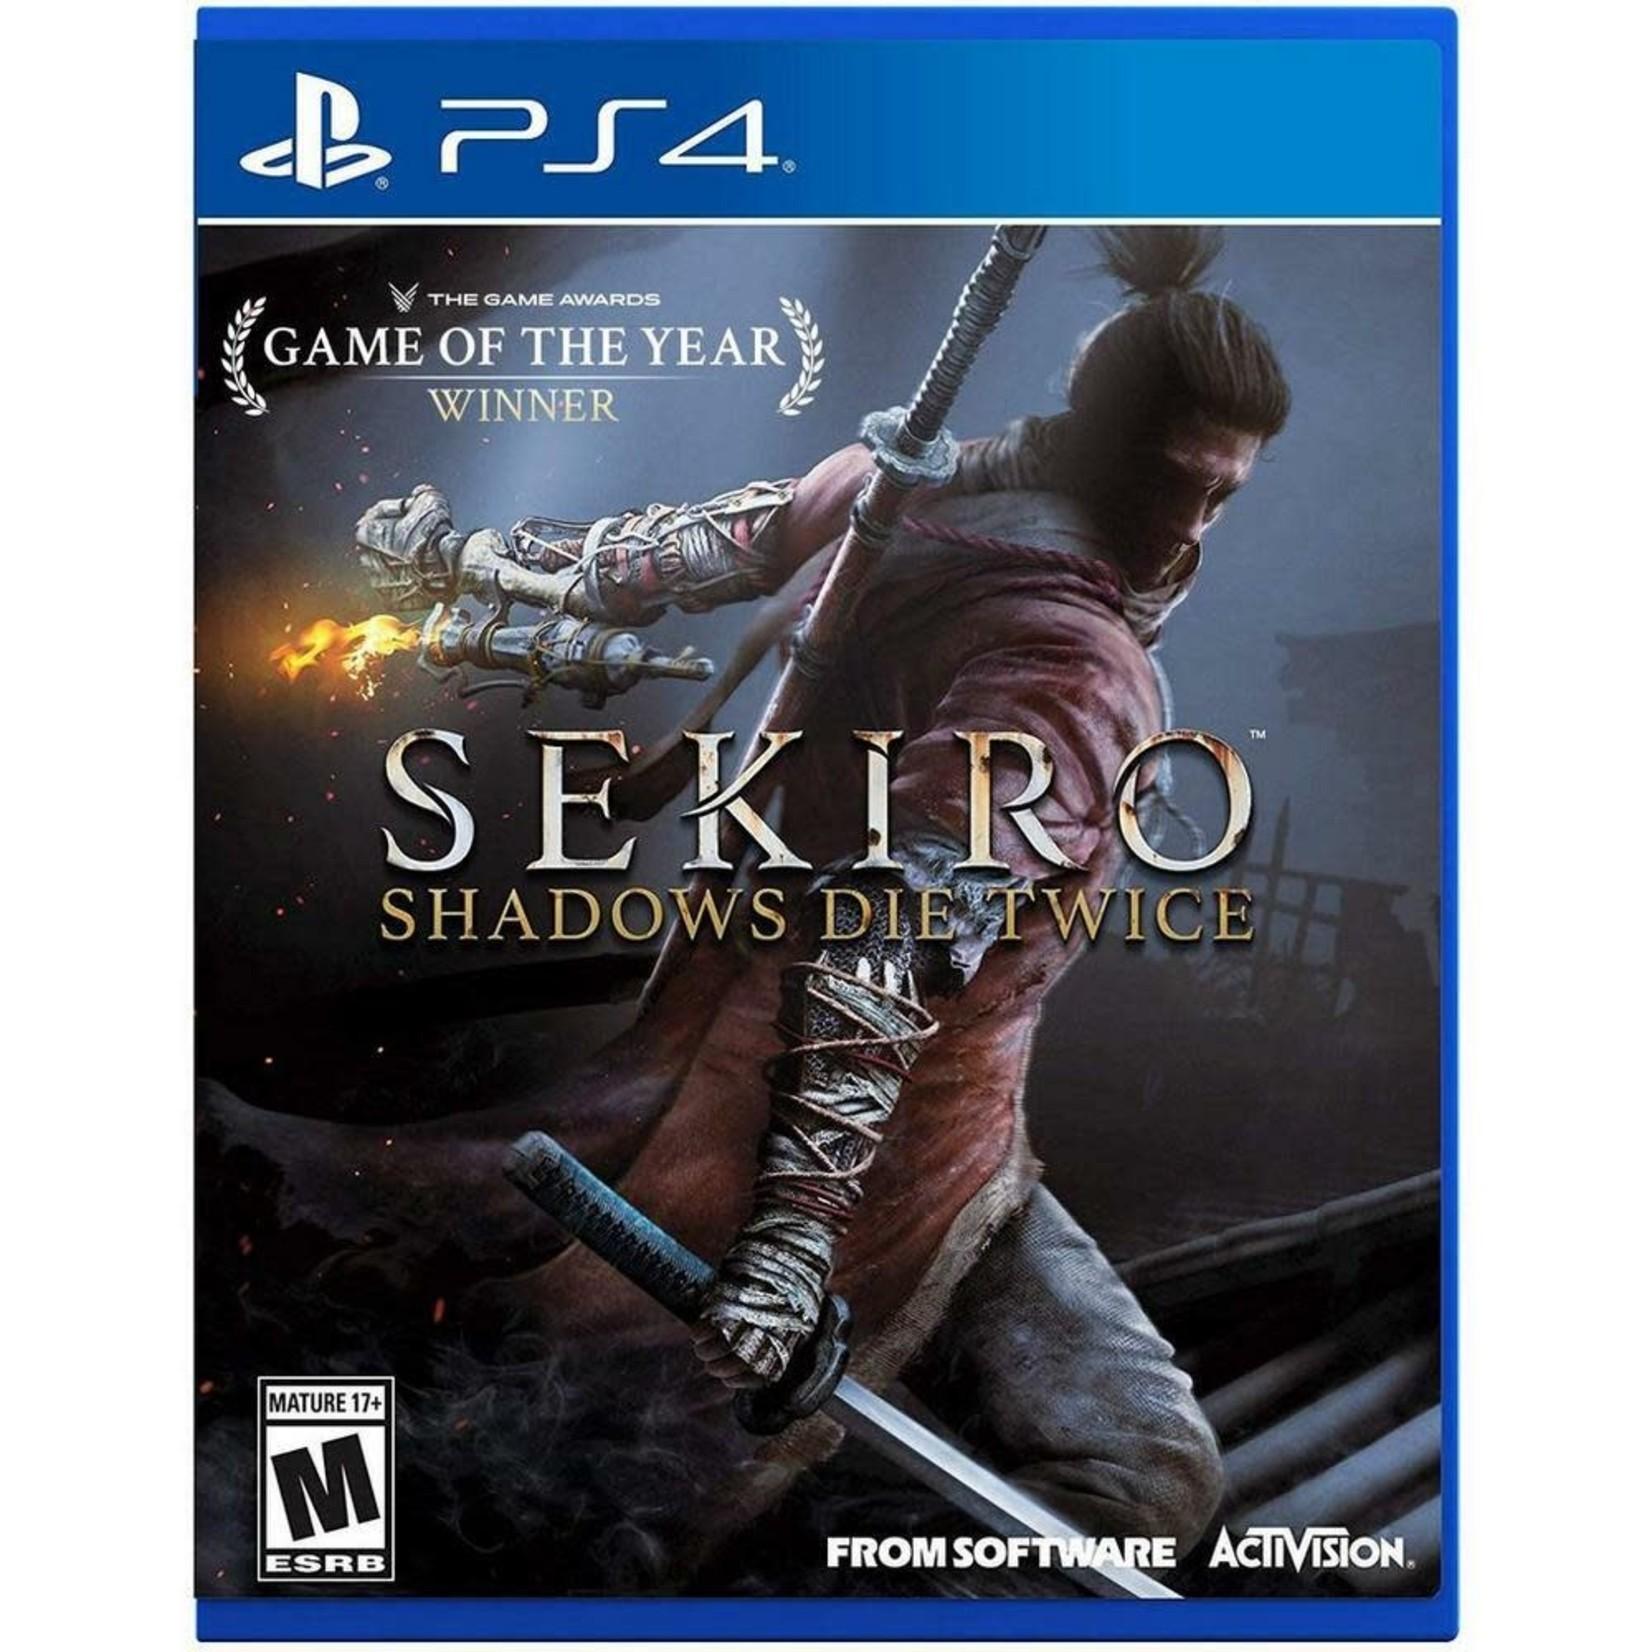 PS4-Sekiro: Shadows Die Twice